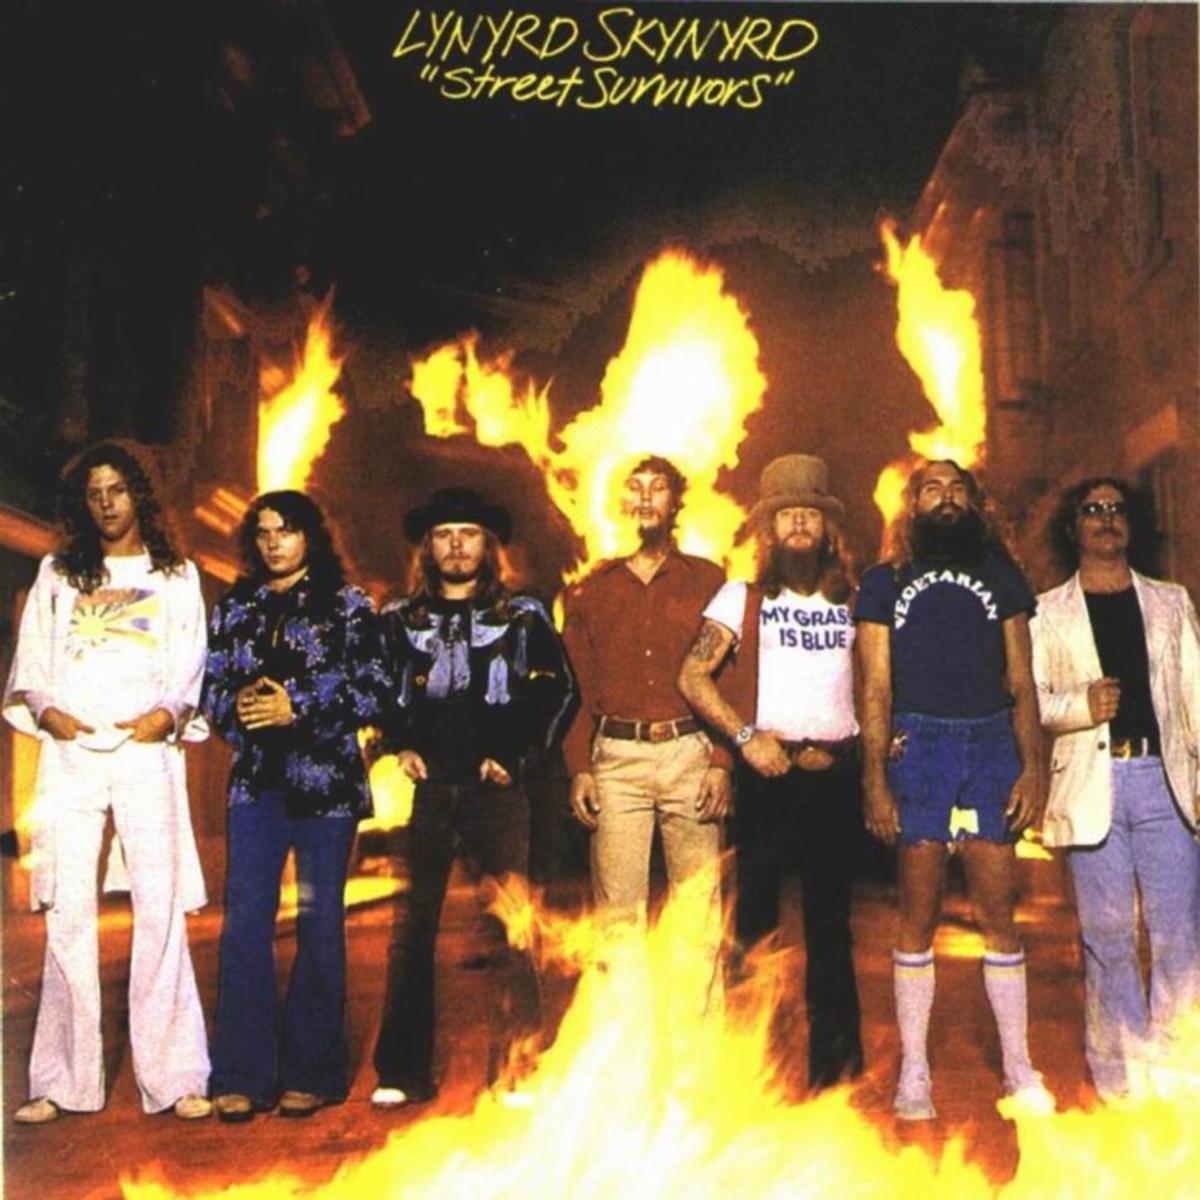 Lynyrd Skynyrd's Street Survivors Album Cover